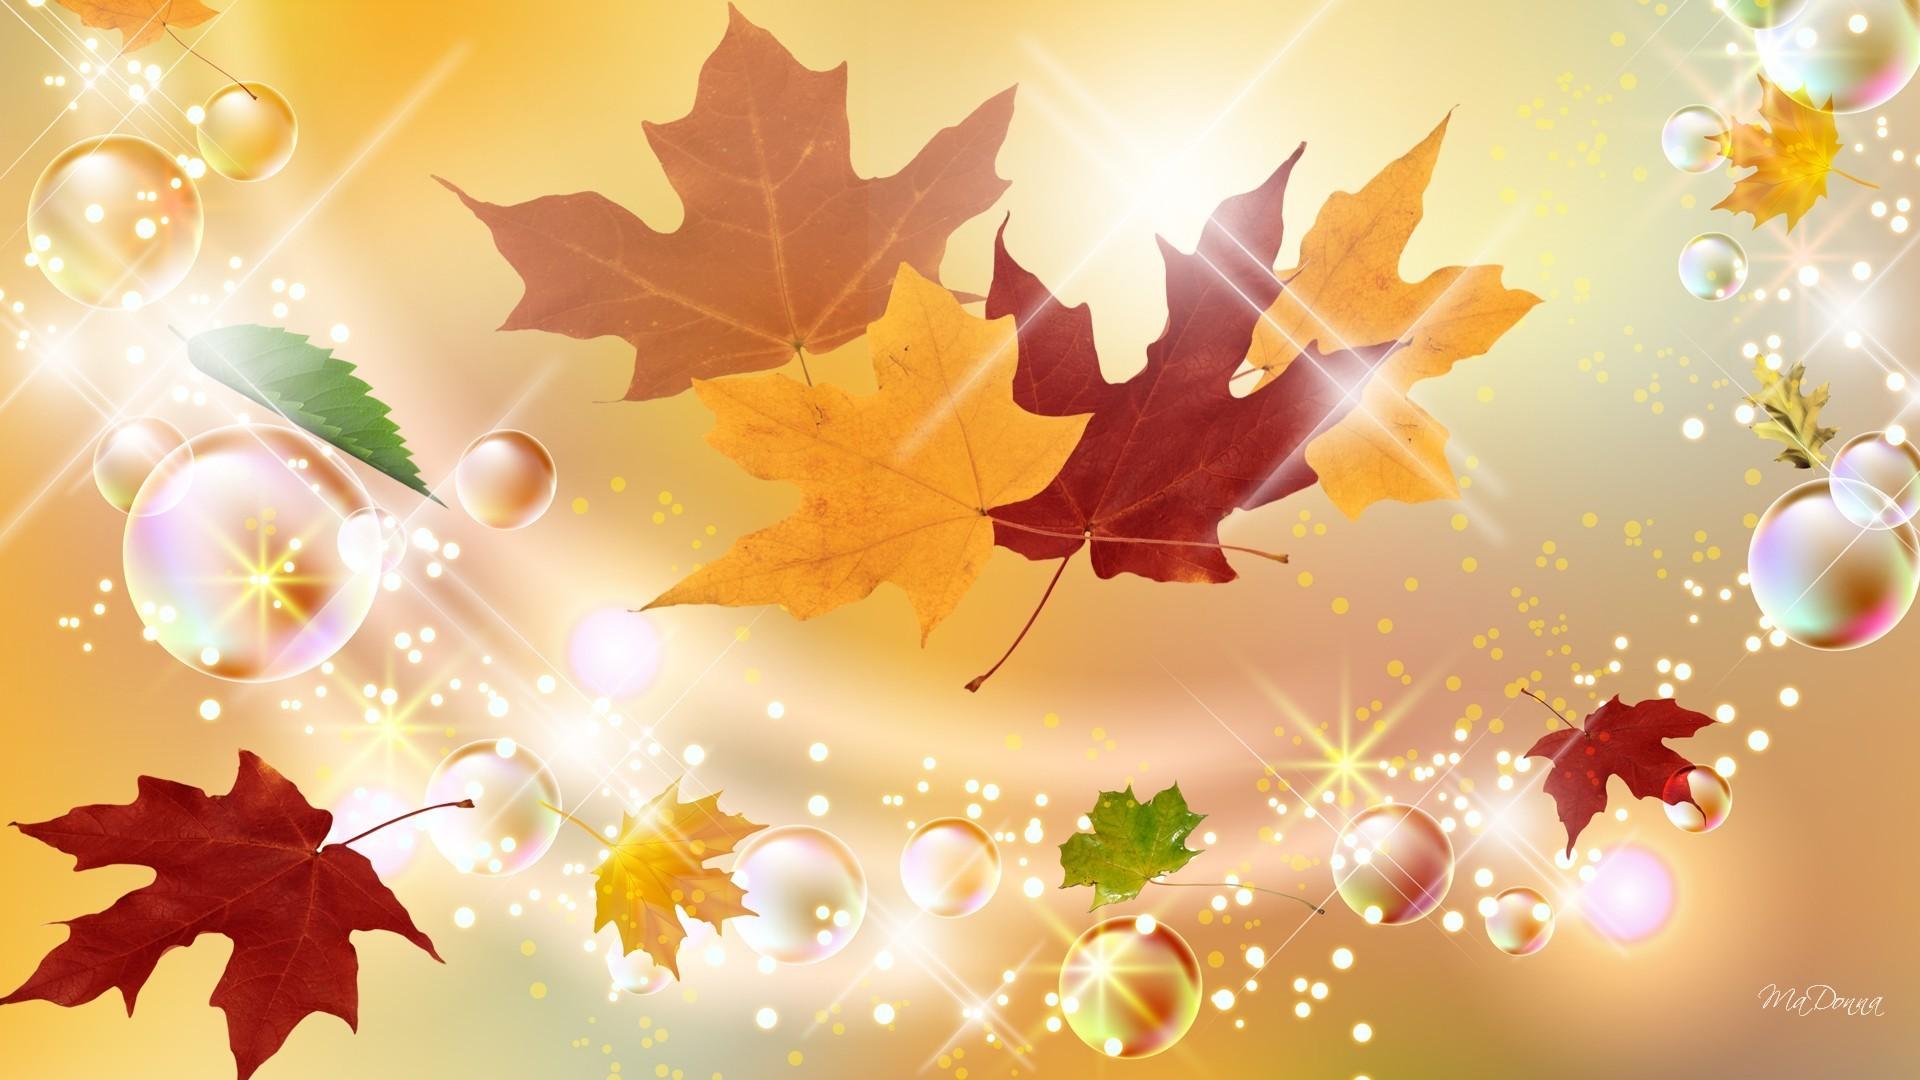 Glitter Tag – Shine Autumn Radiate Maple Shimmer Breeze Flash Glimmer Glint  Gold Glow Winkle Glister